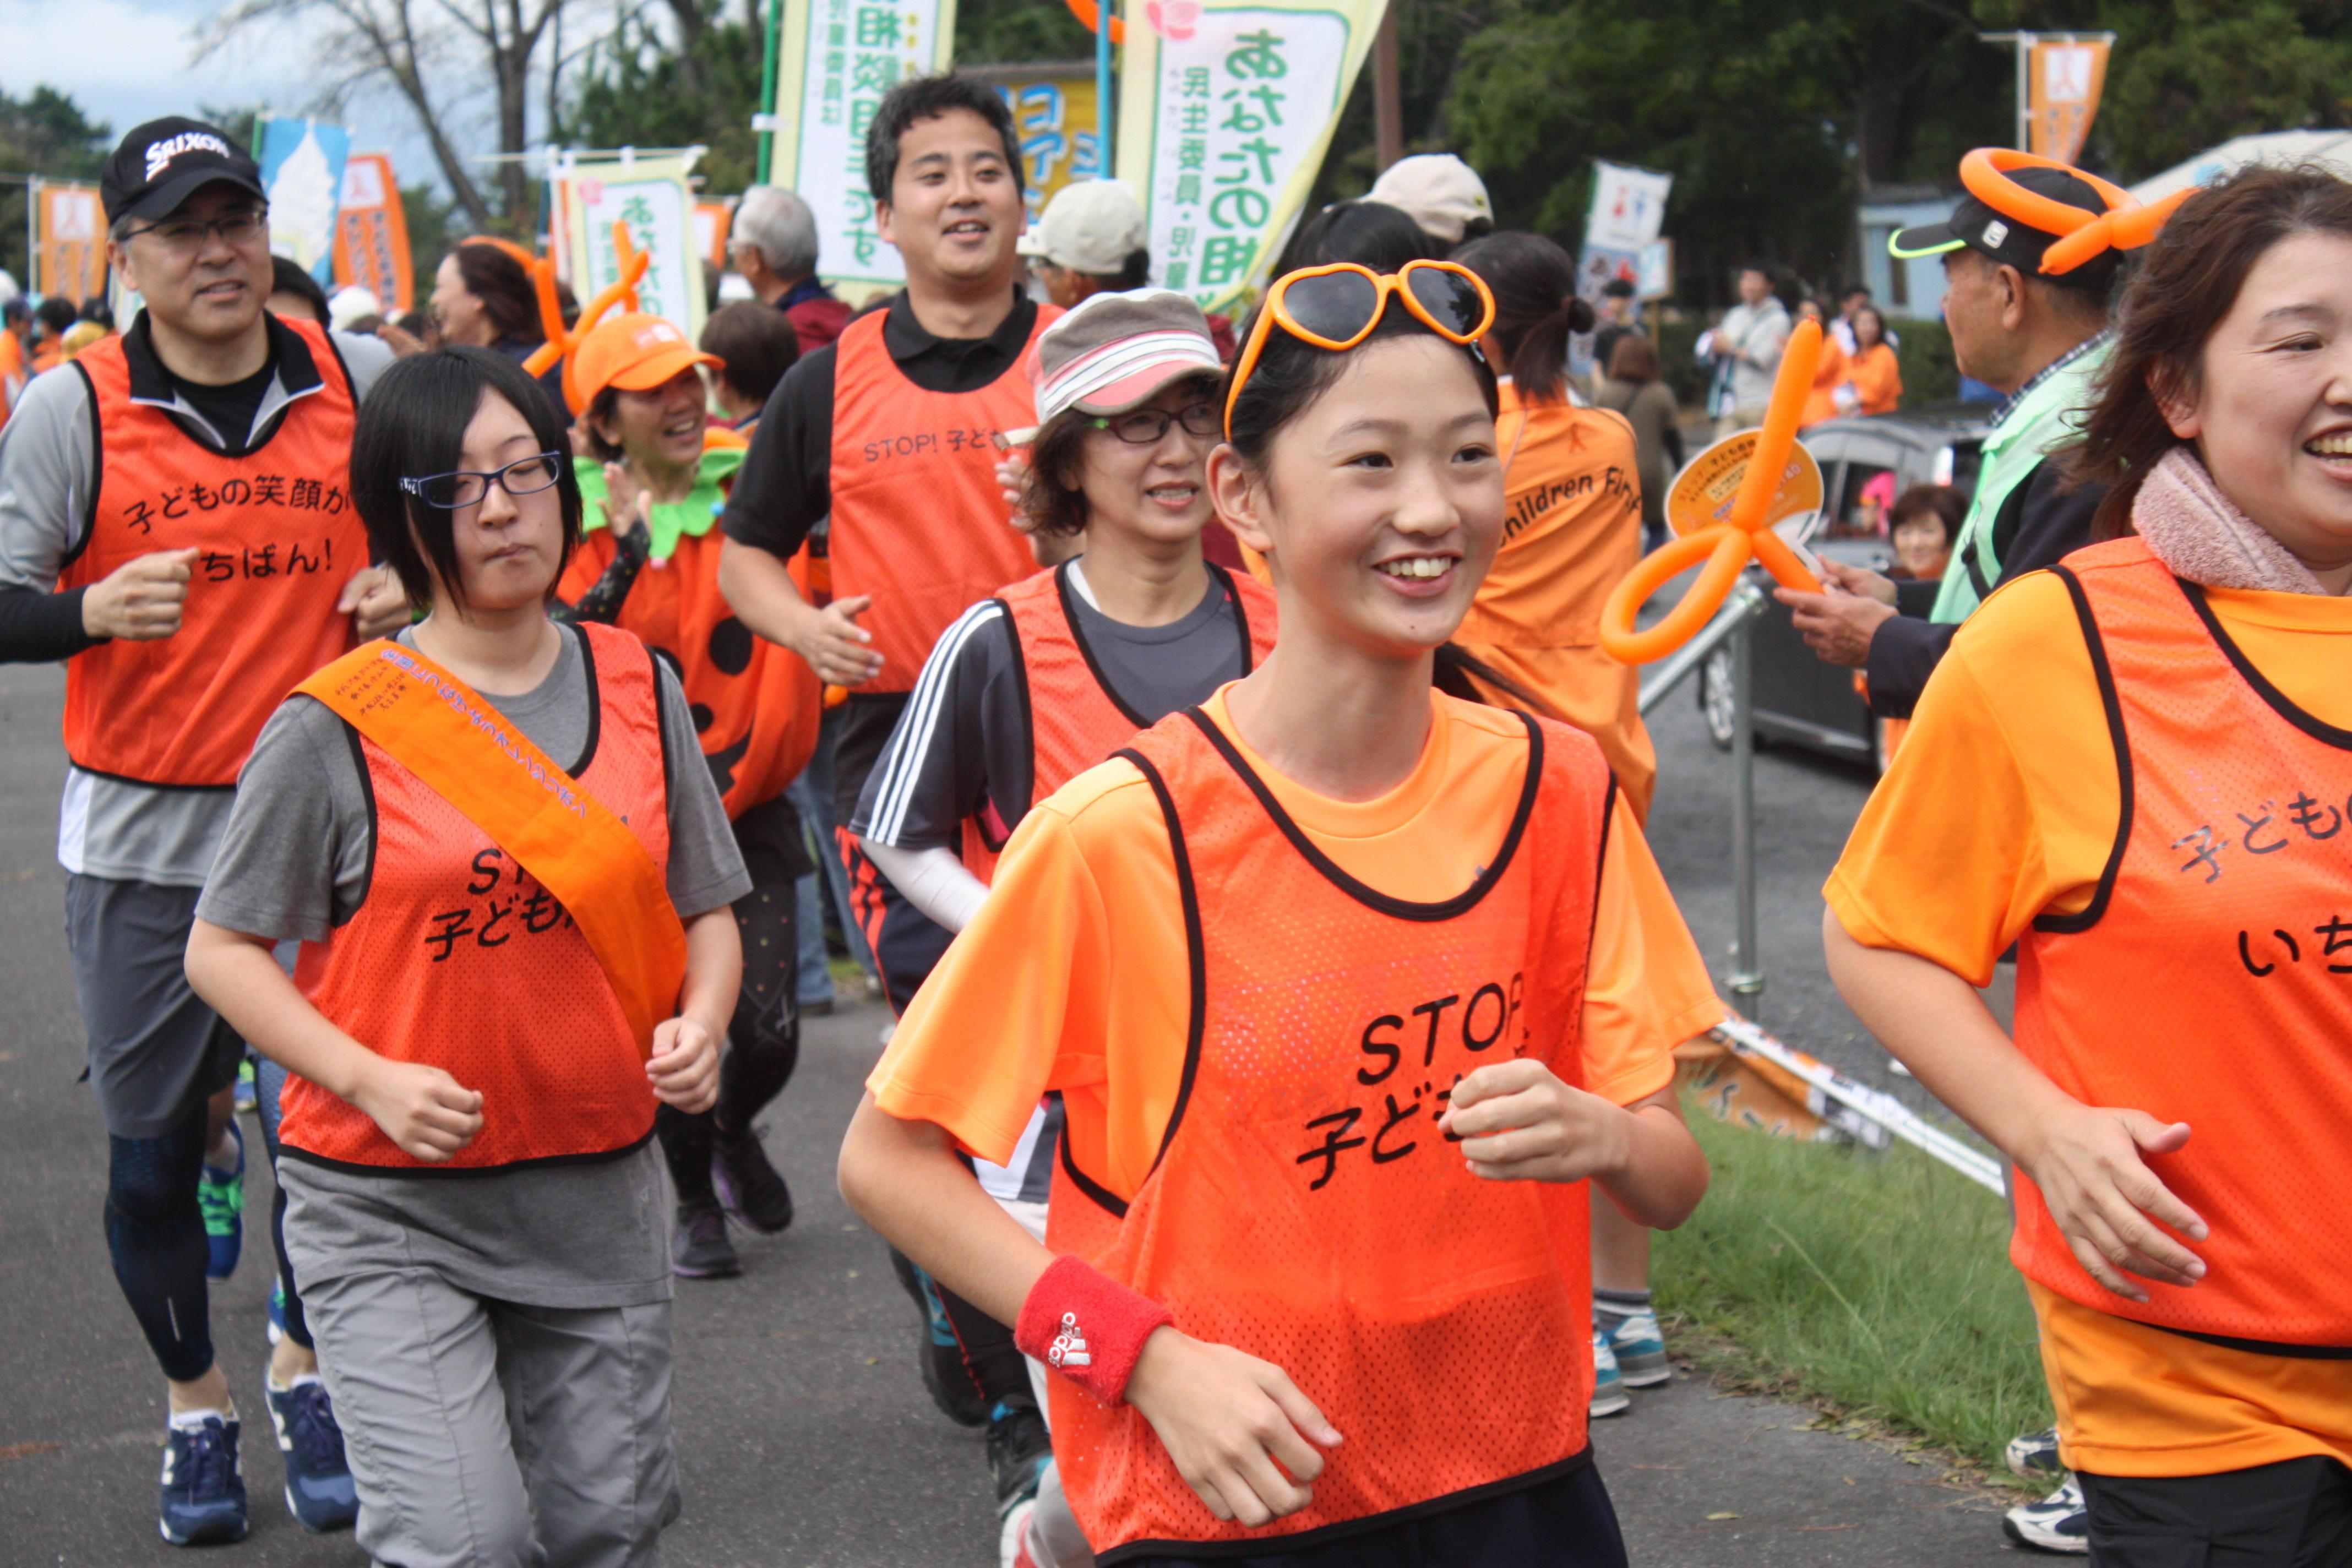 http://www.orangeribbon.jp/info/organization/IMG_2335.JPG